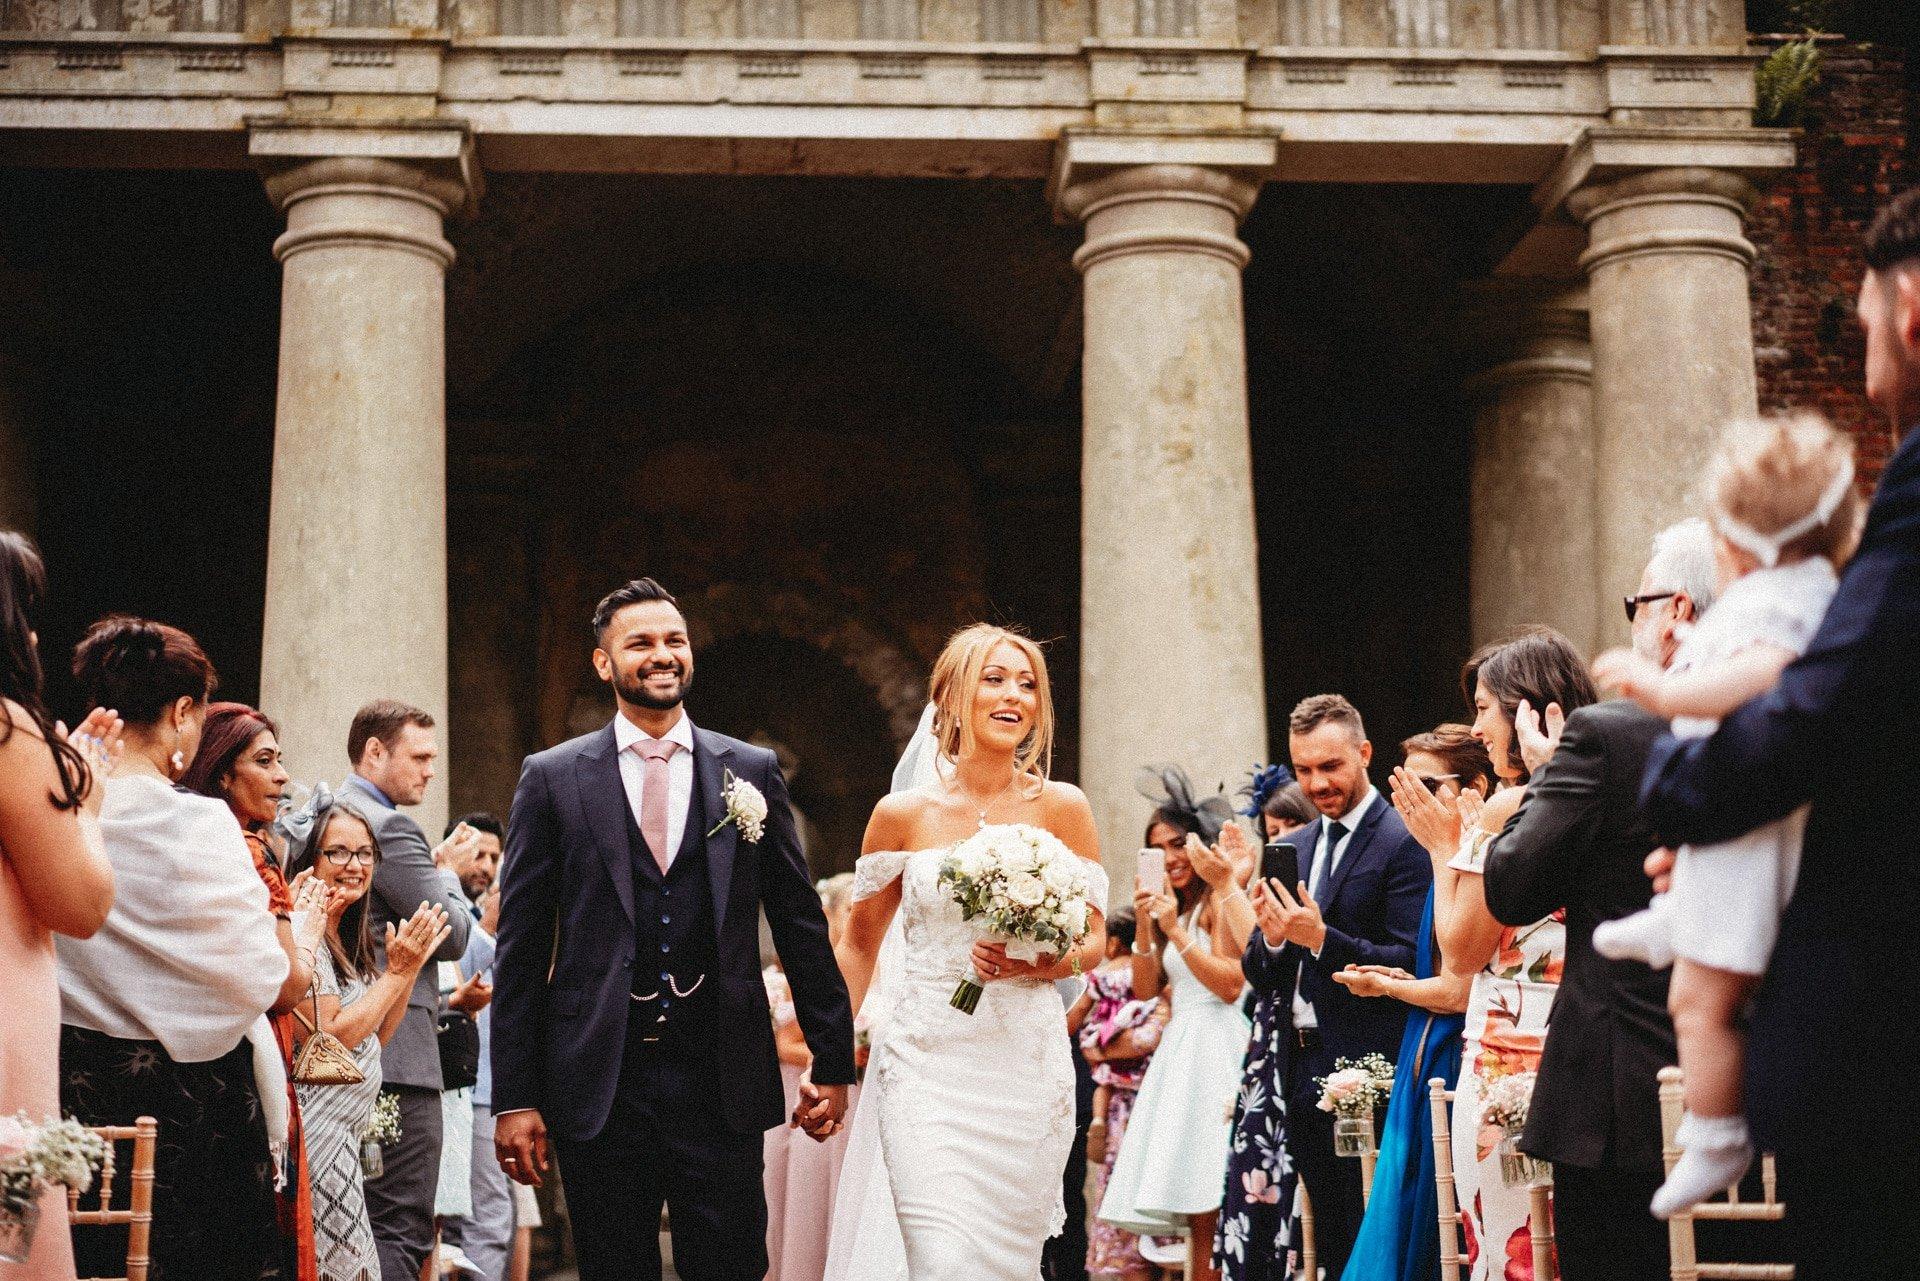 Wotton House Wedding Photographer Outdoor Ceremony